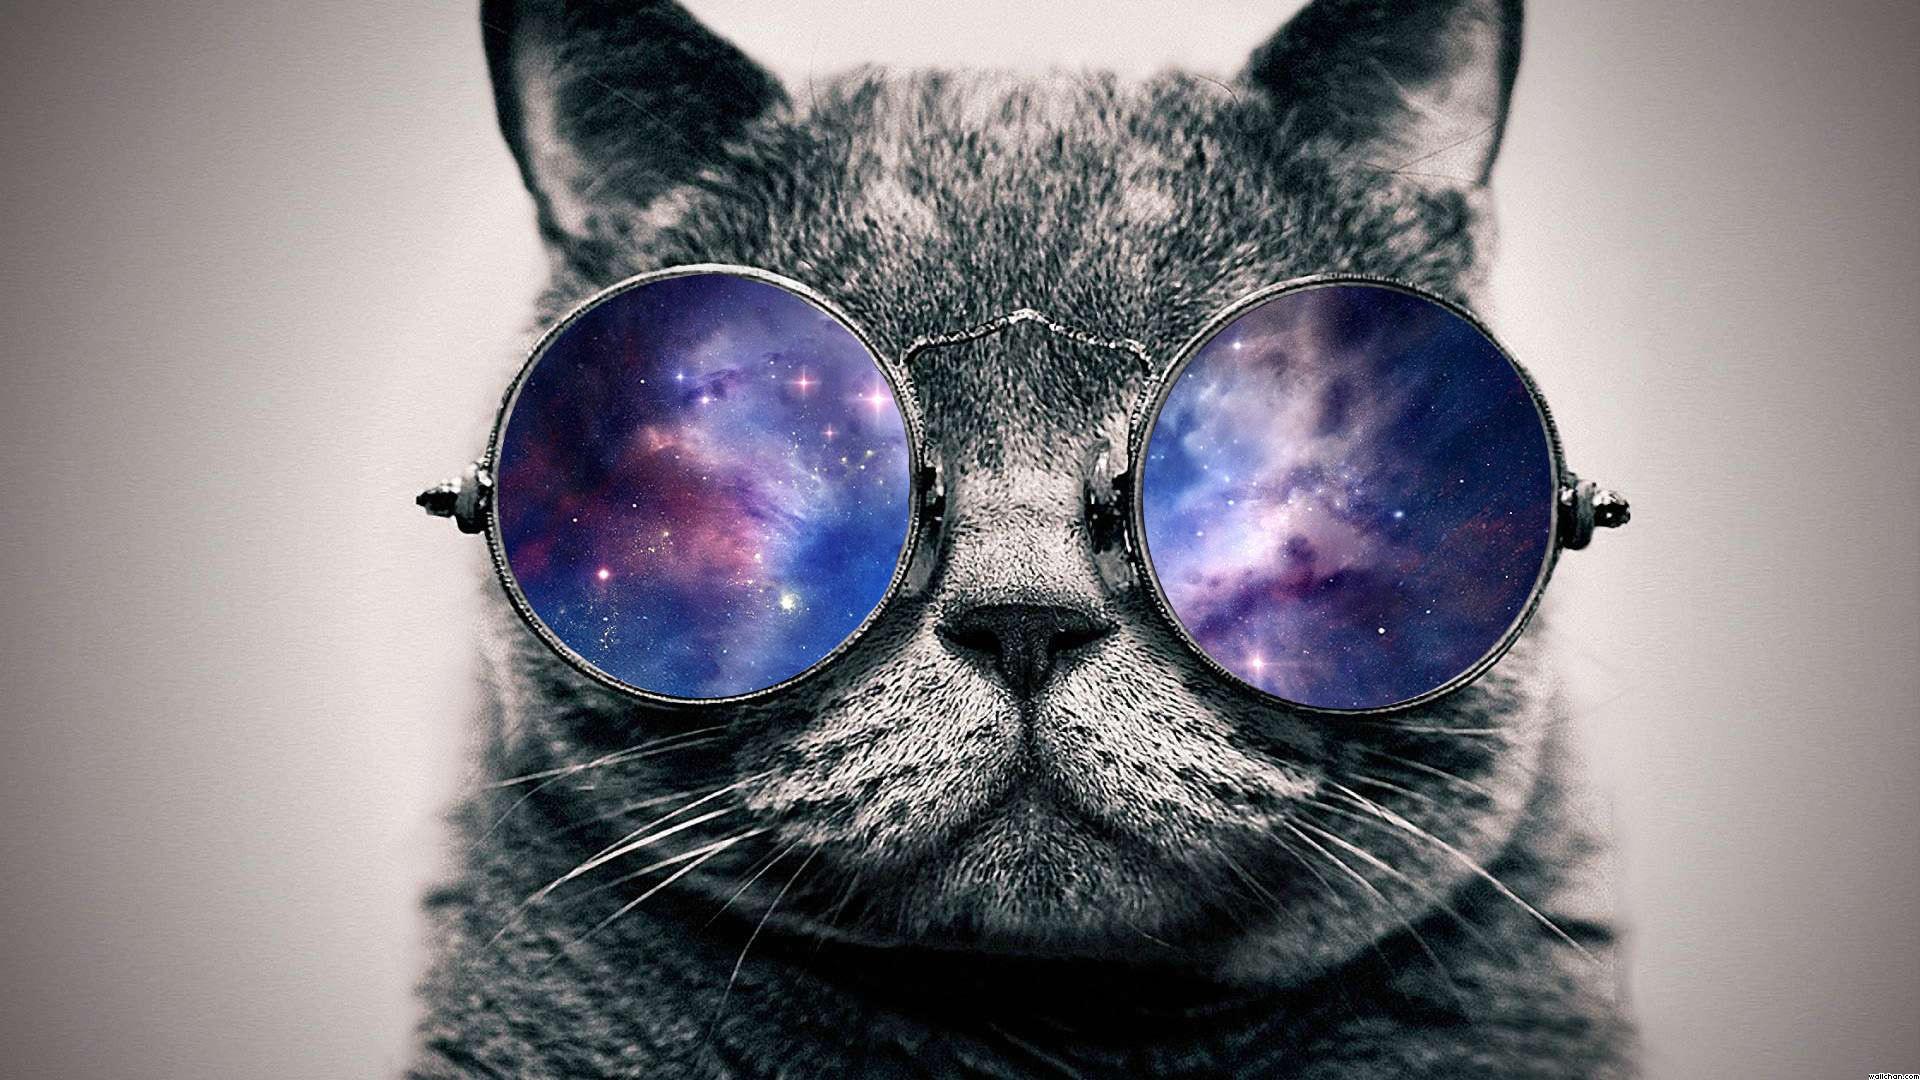 39 Cats Unicorns And Galaxies Wallpaper On Wallpapersafari